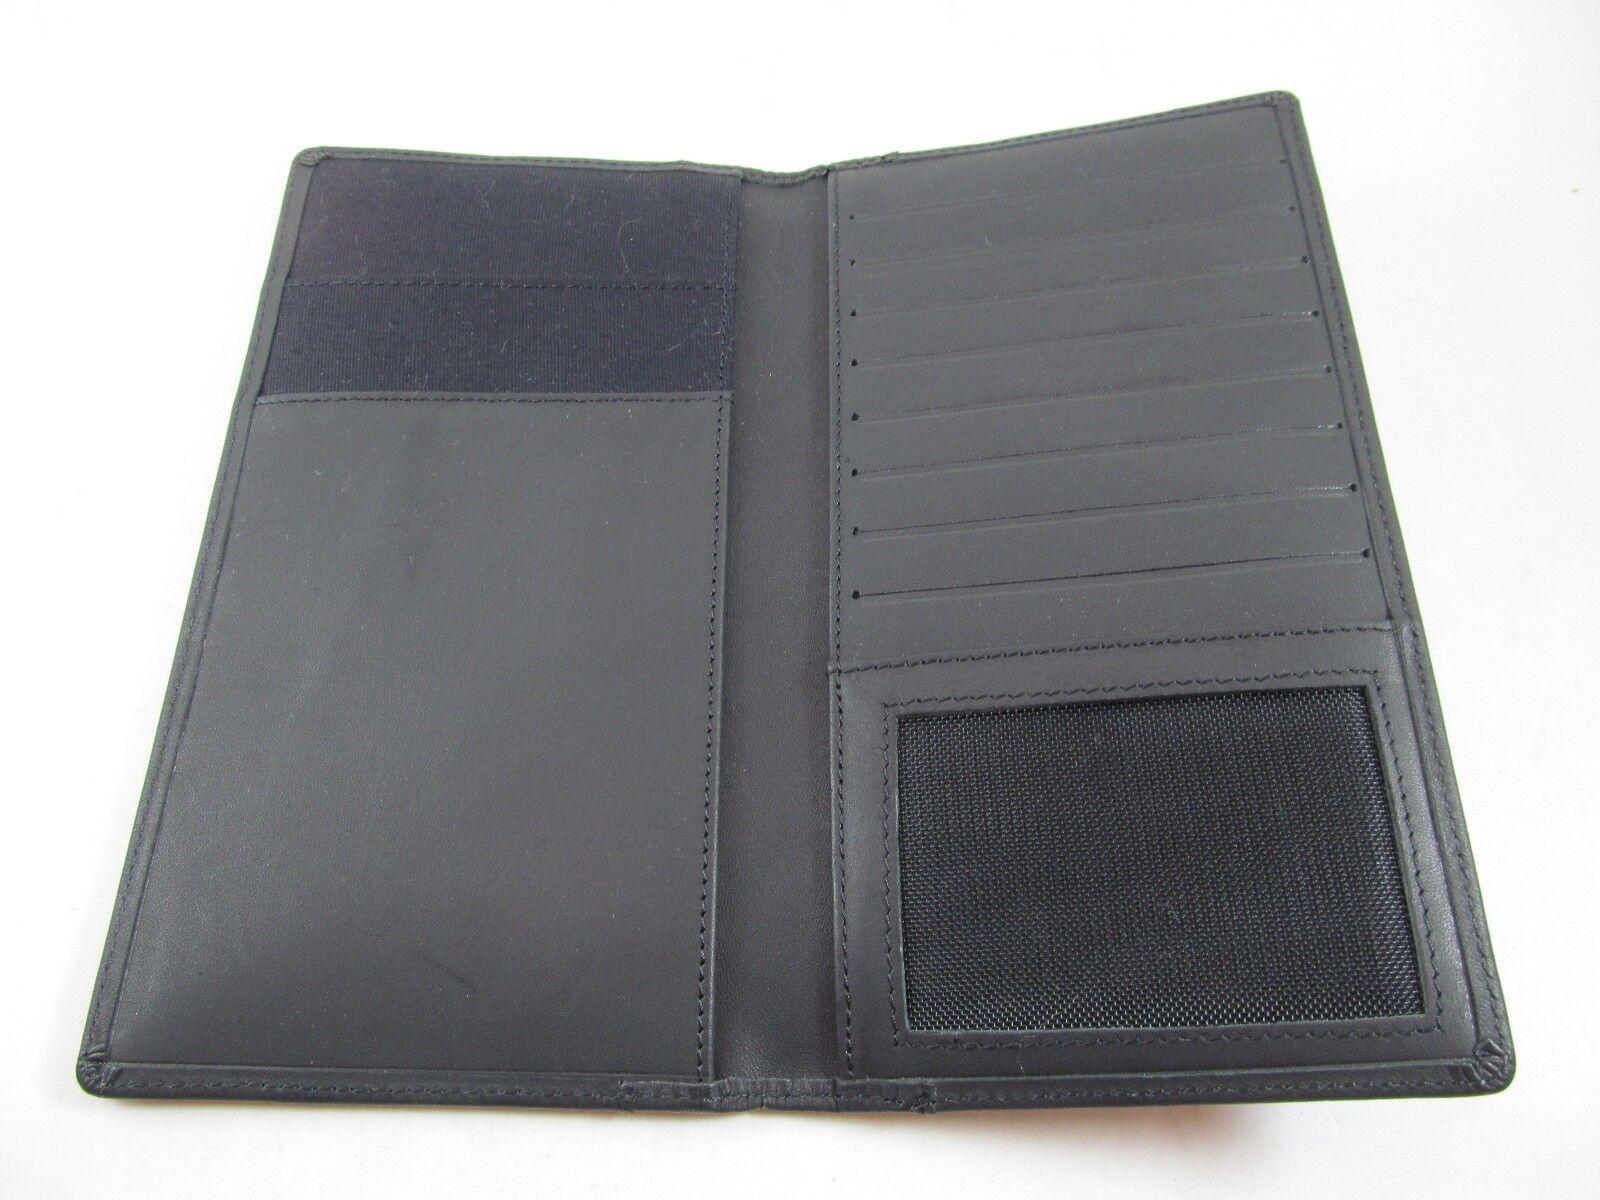 CLAVA American leather black wallet credit card organizer 8